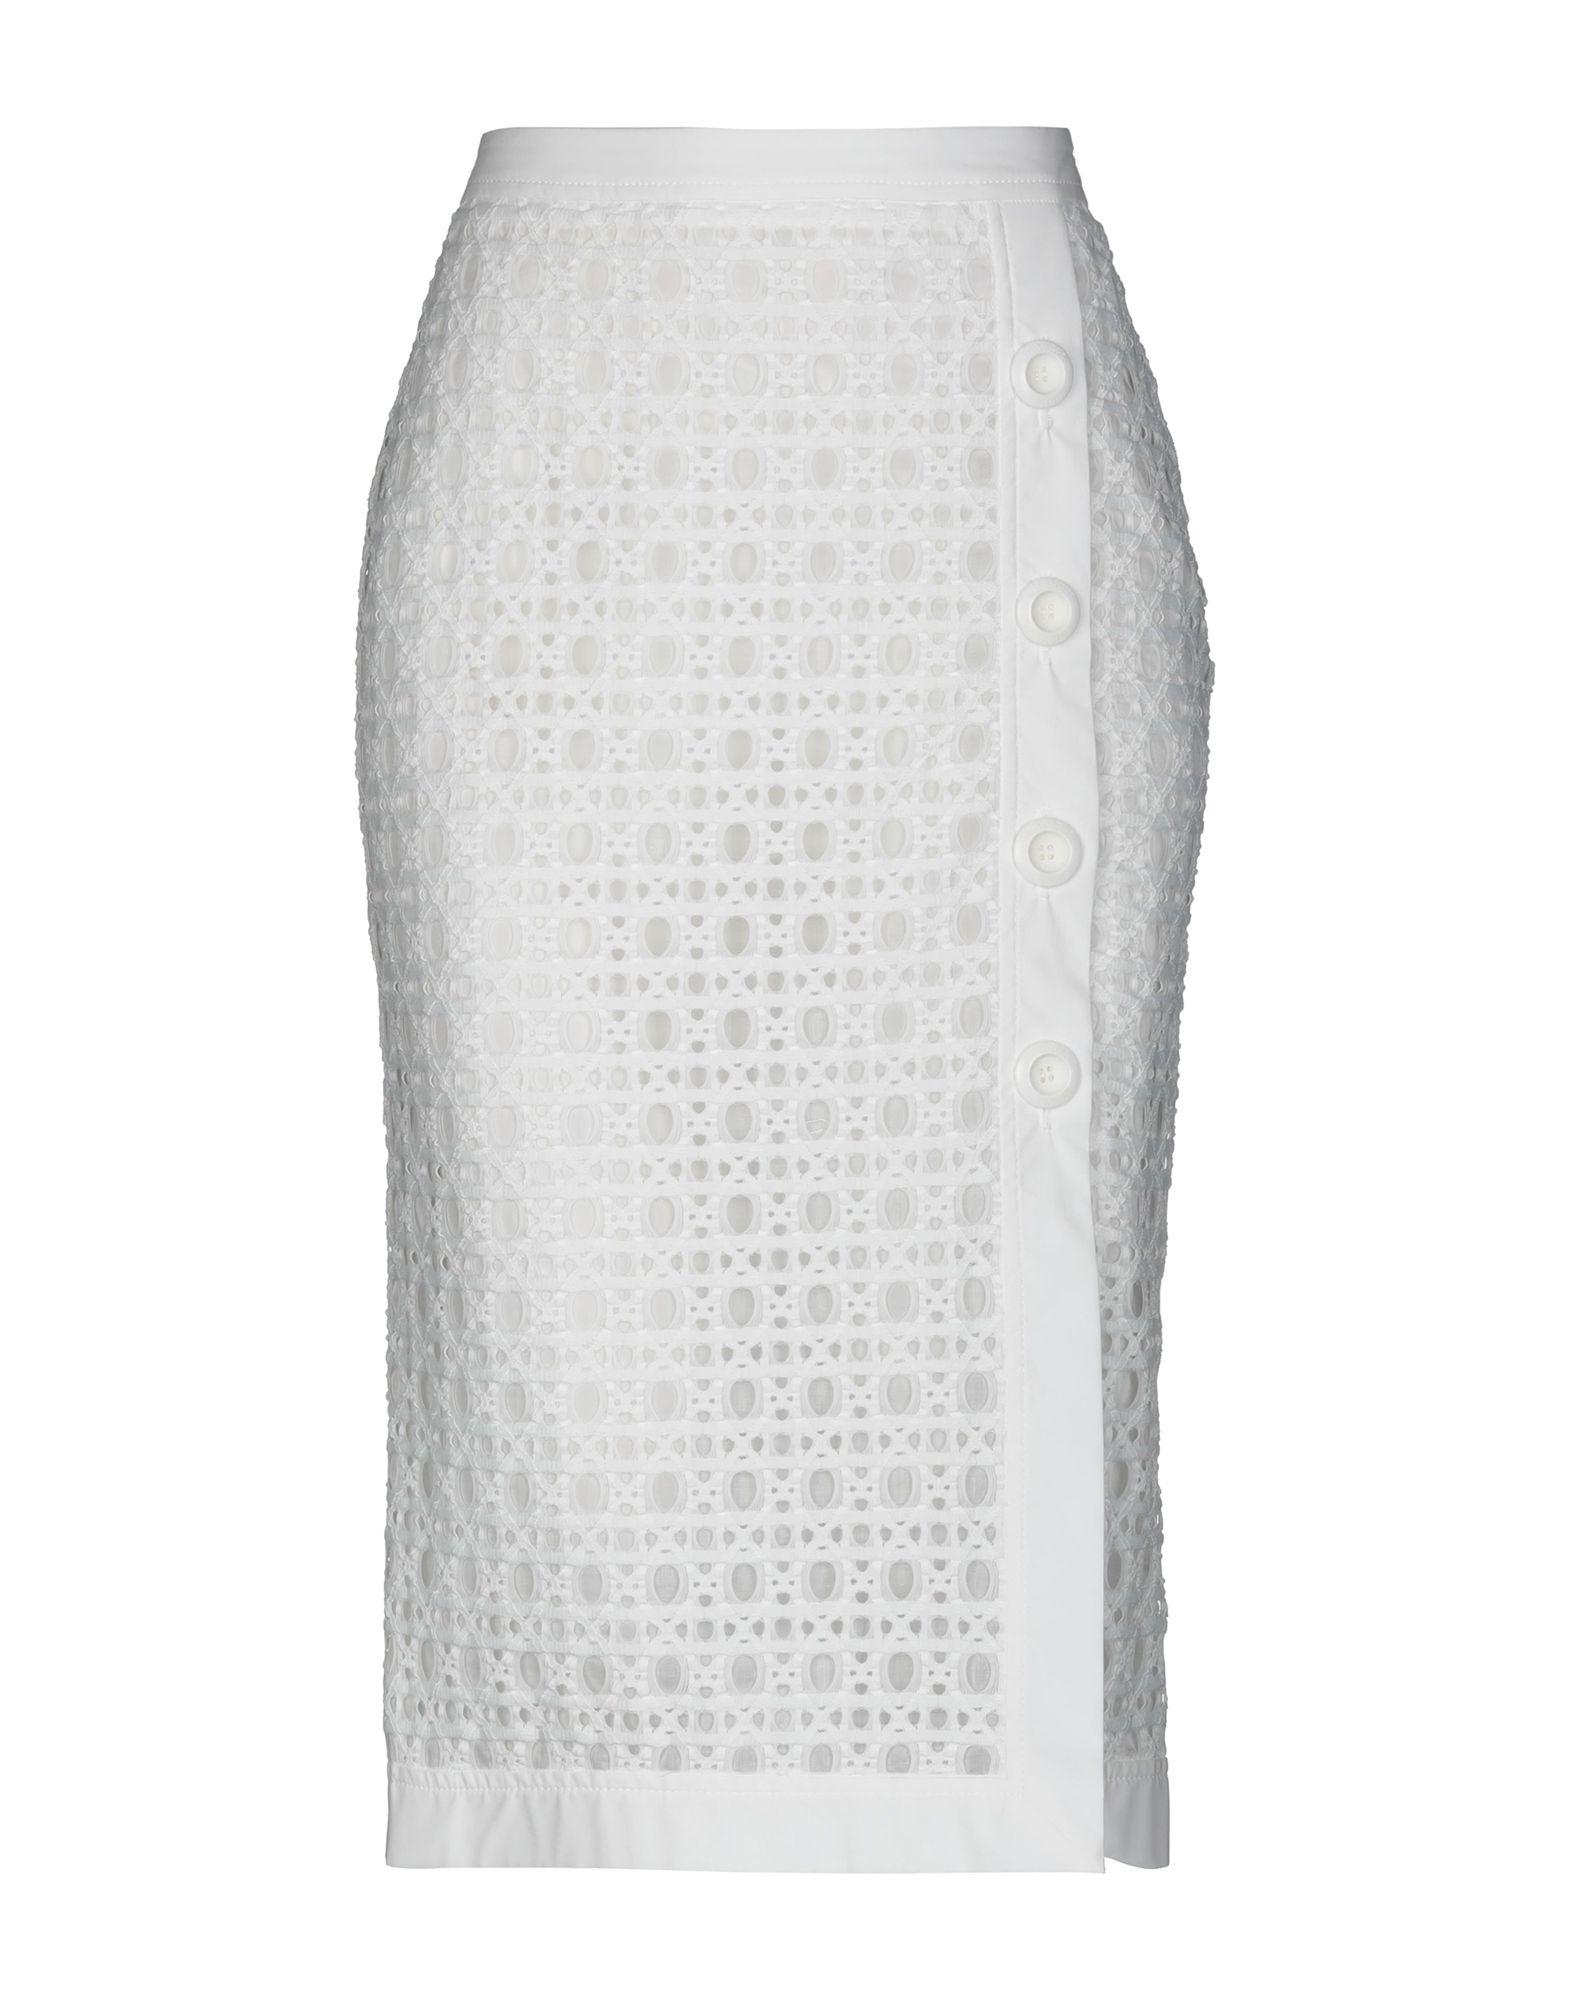 BOUTIQUE MOSCHINO Юбка длиной 3/4 moschino couture юбка длиной 3 4